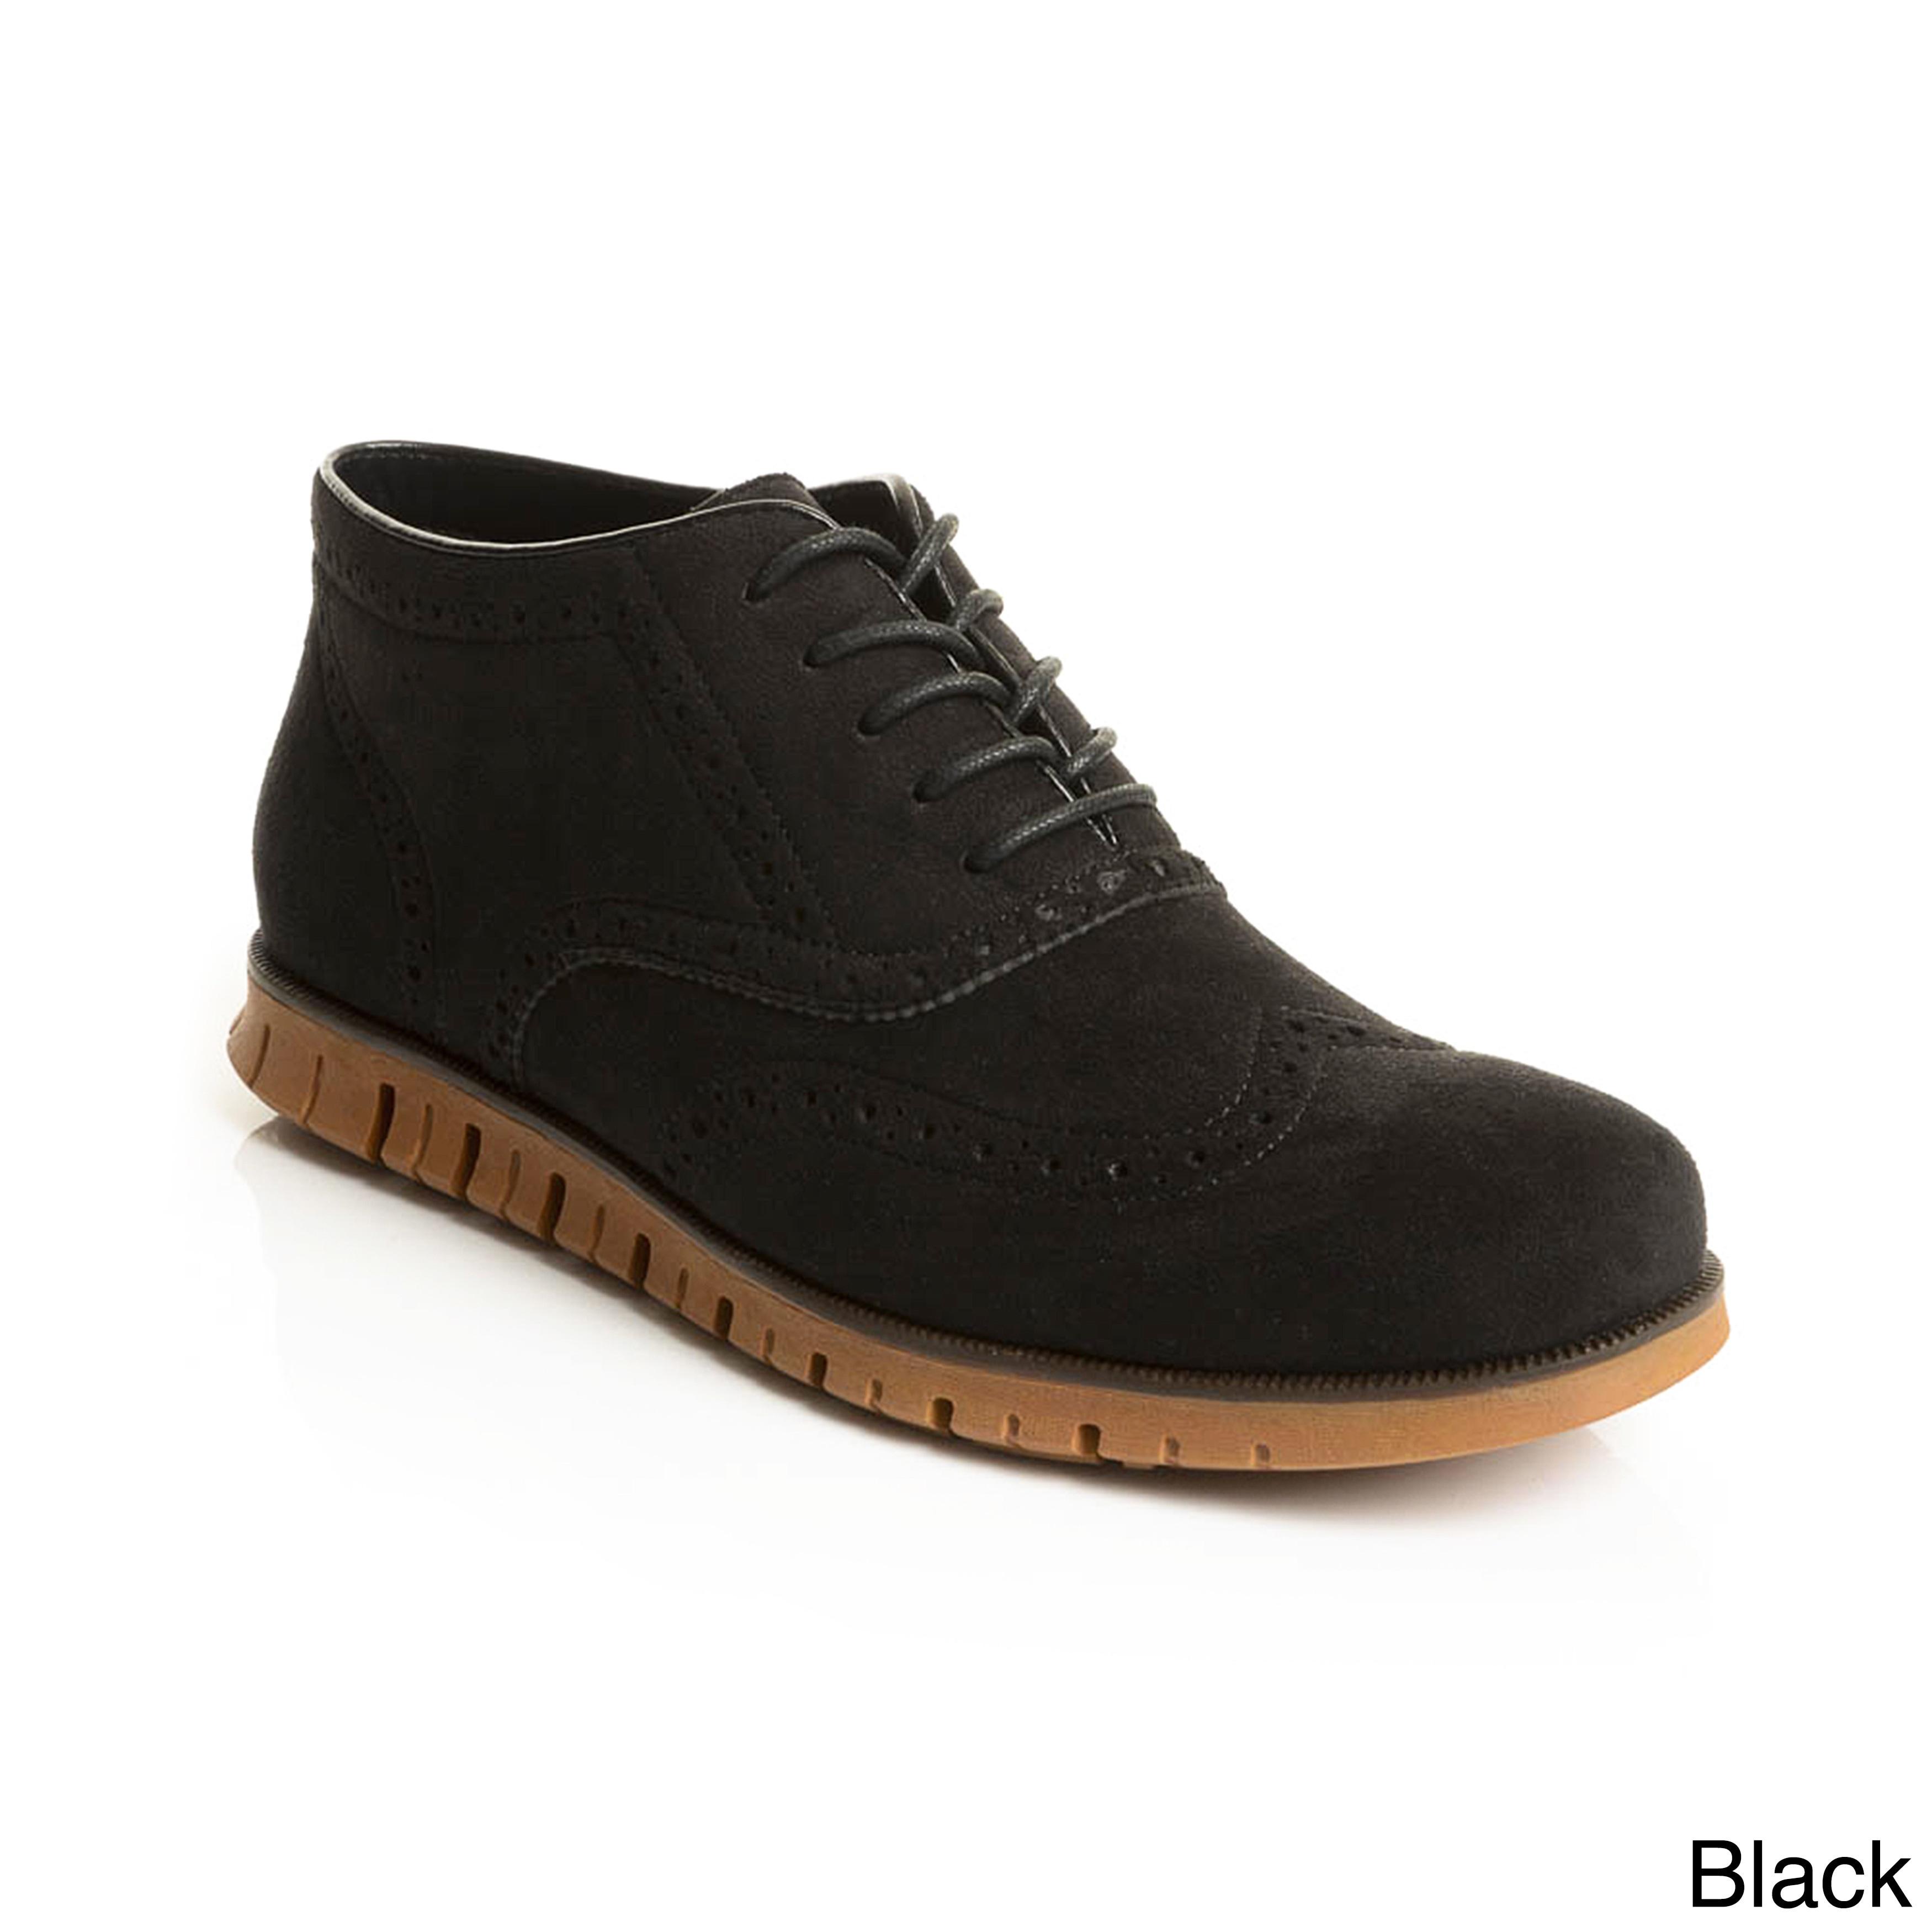 Henry Ferrera Mens Shoes